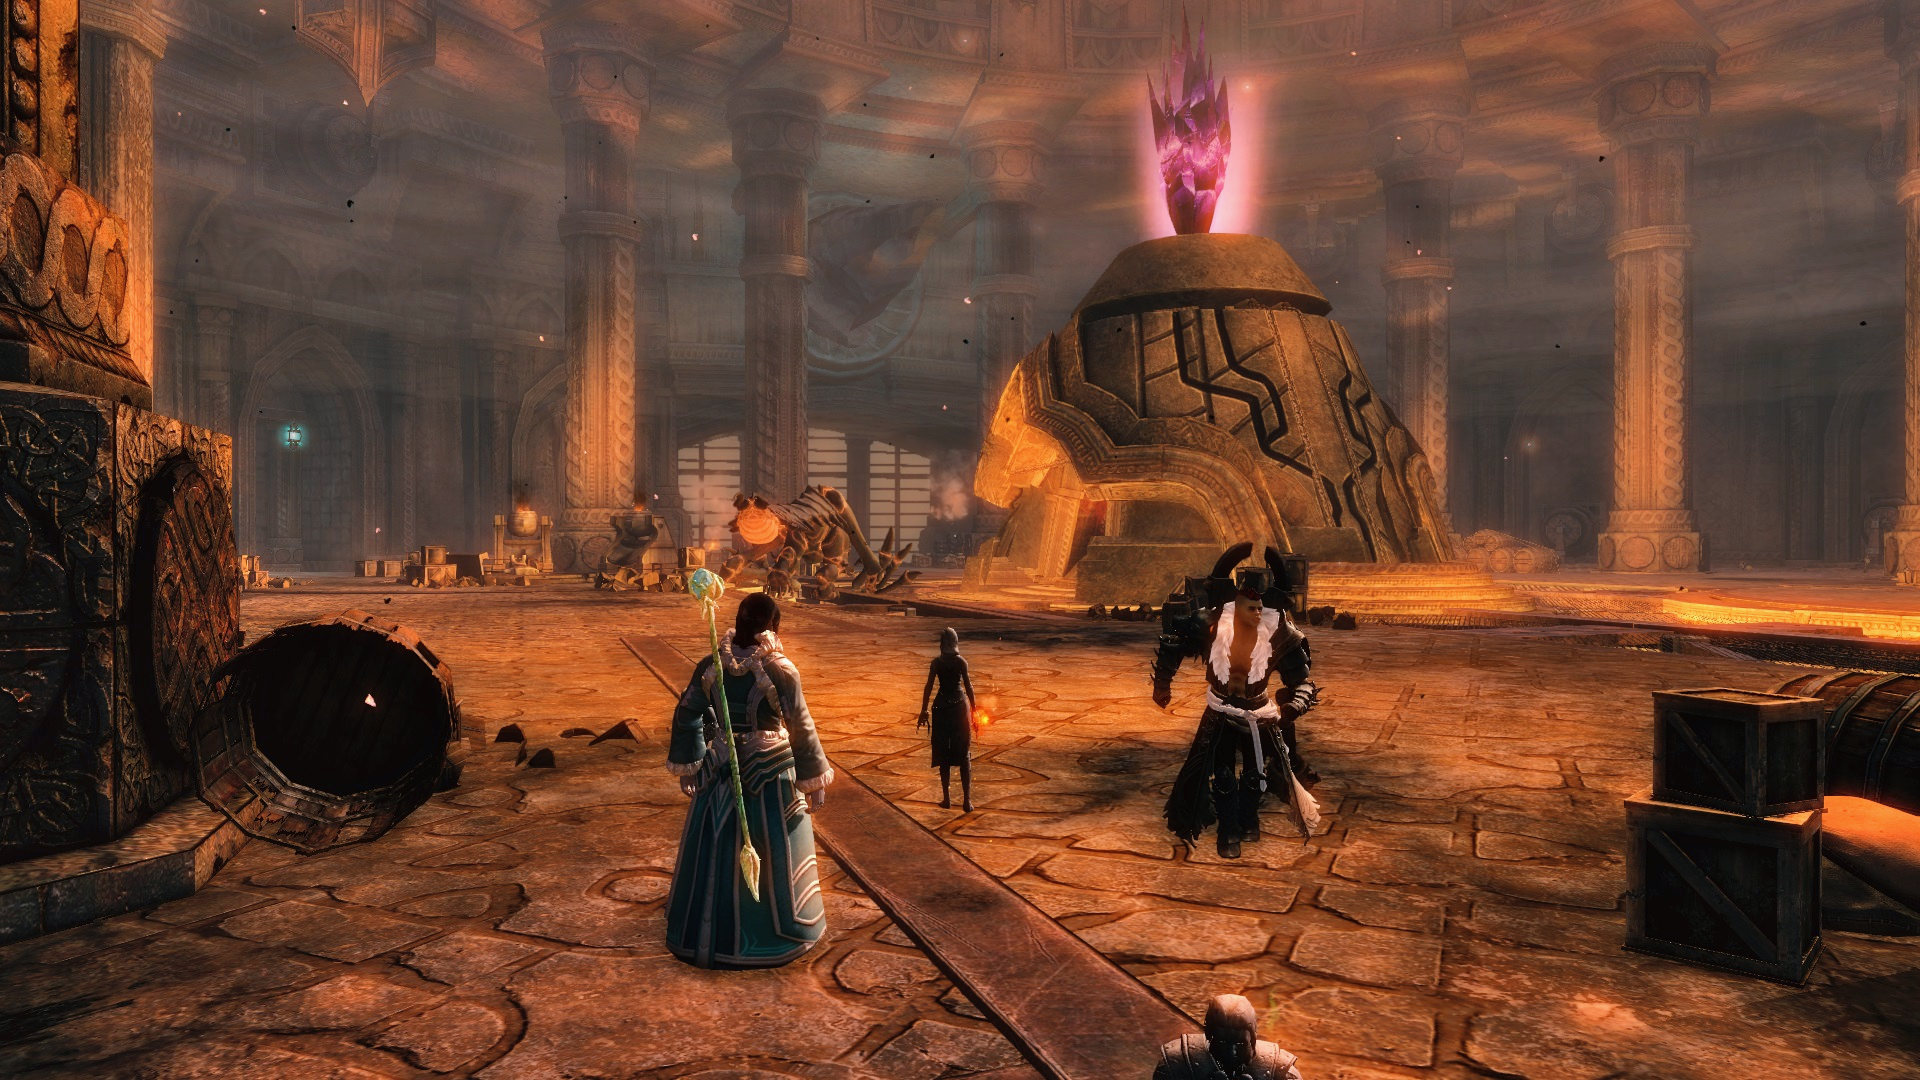 Guild Wars 2 power recensione Champions GW2 the Icebrood Saga